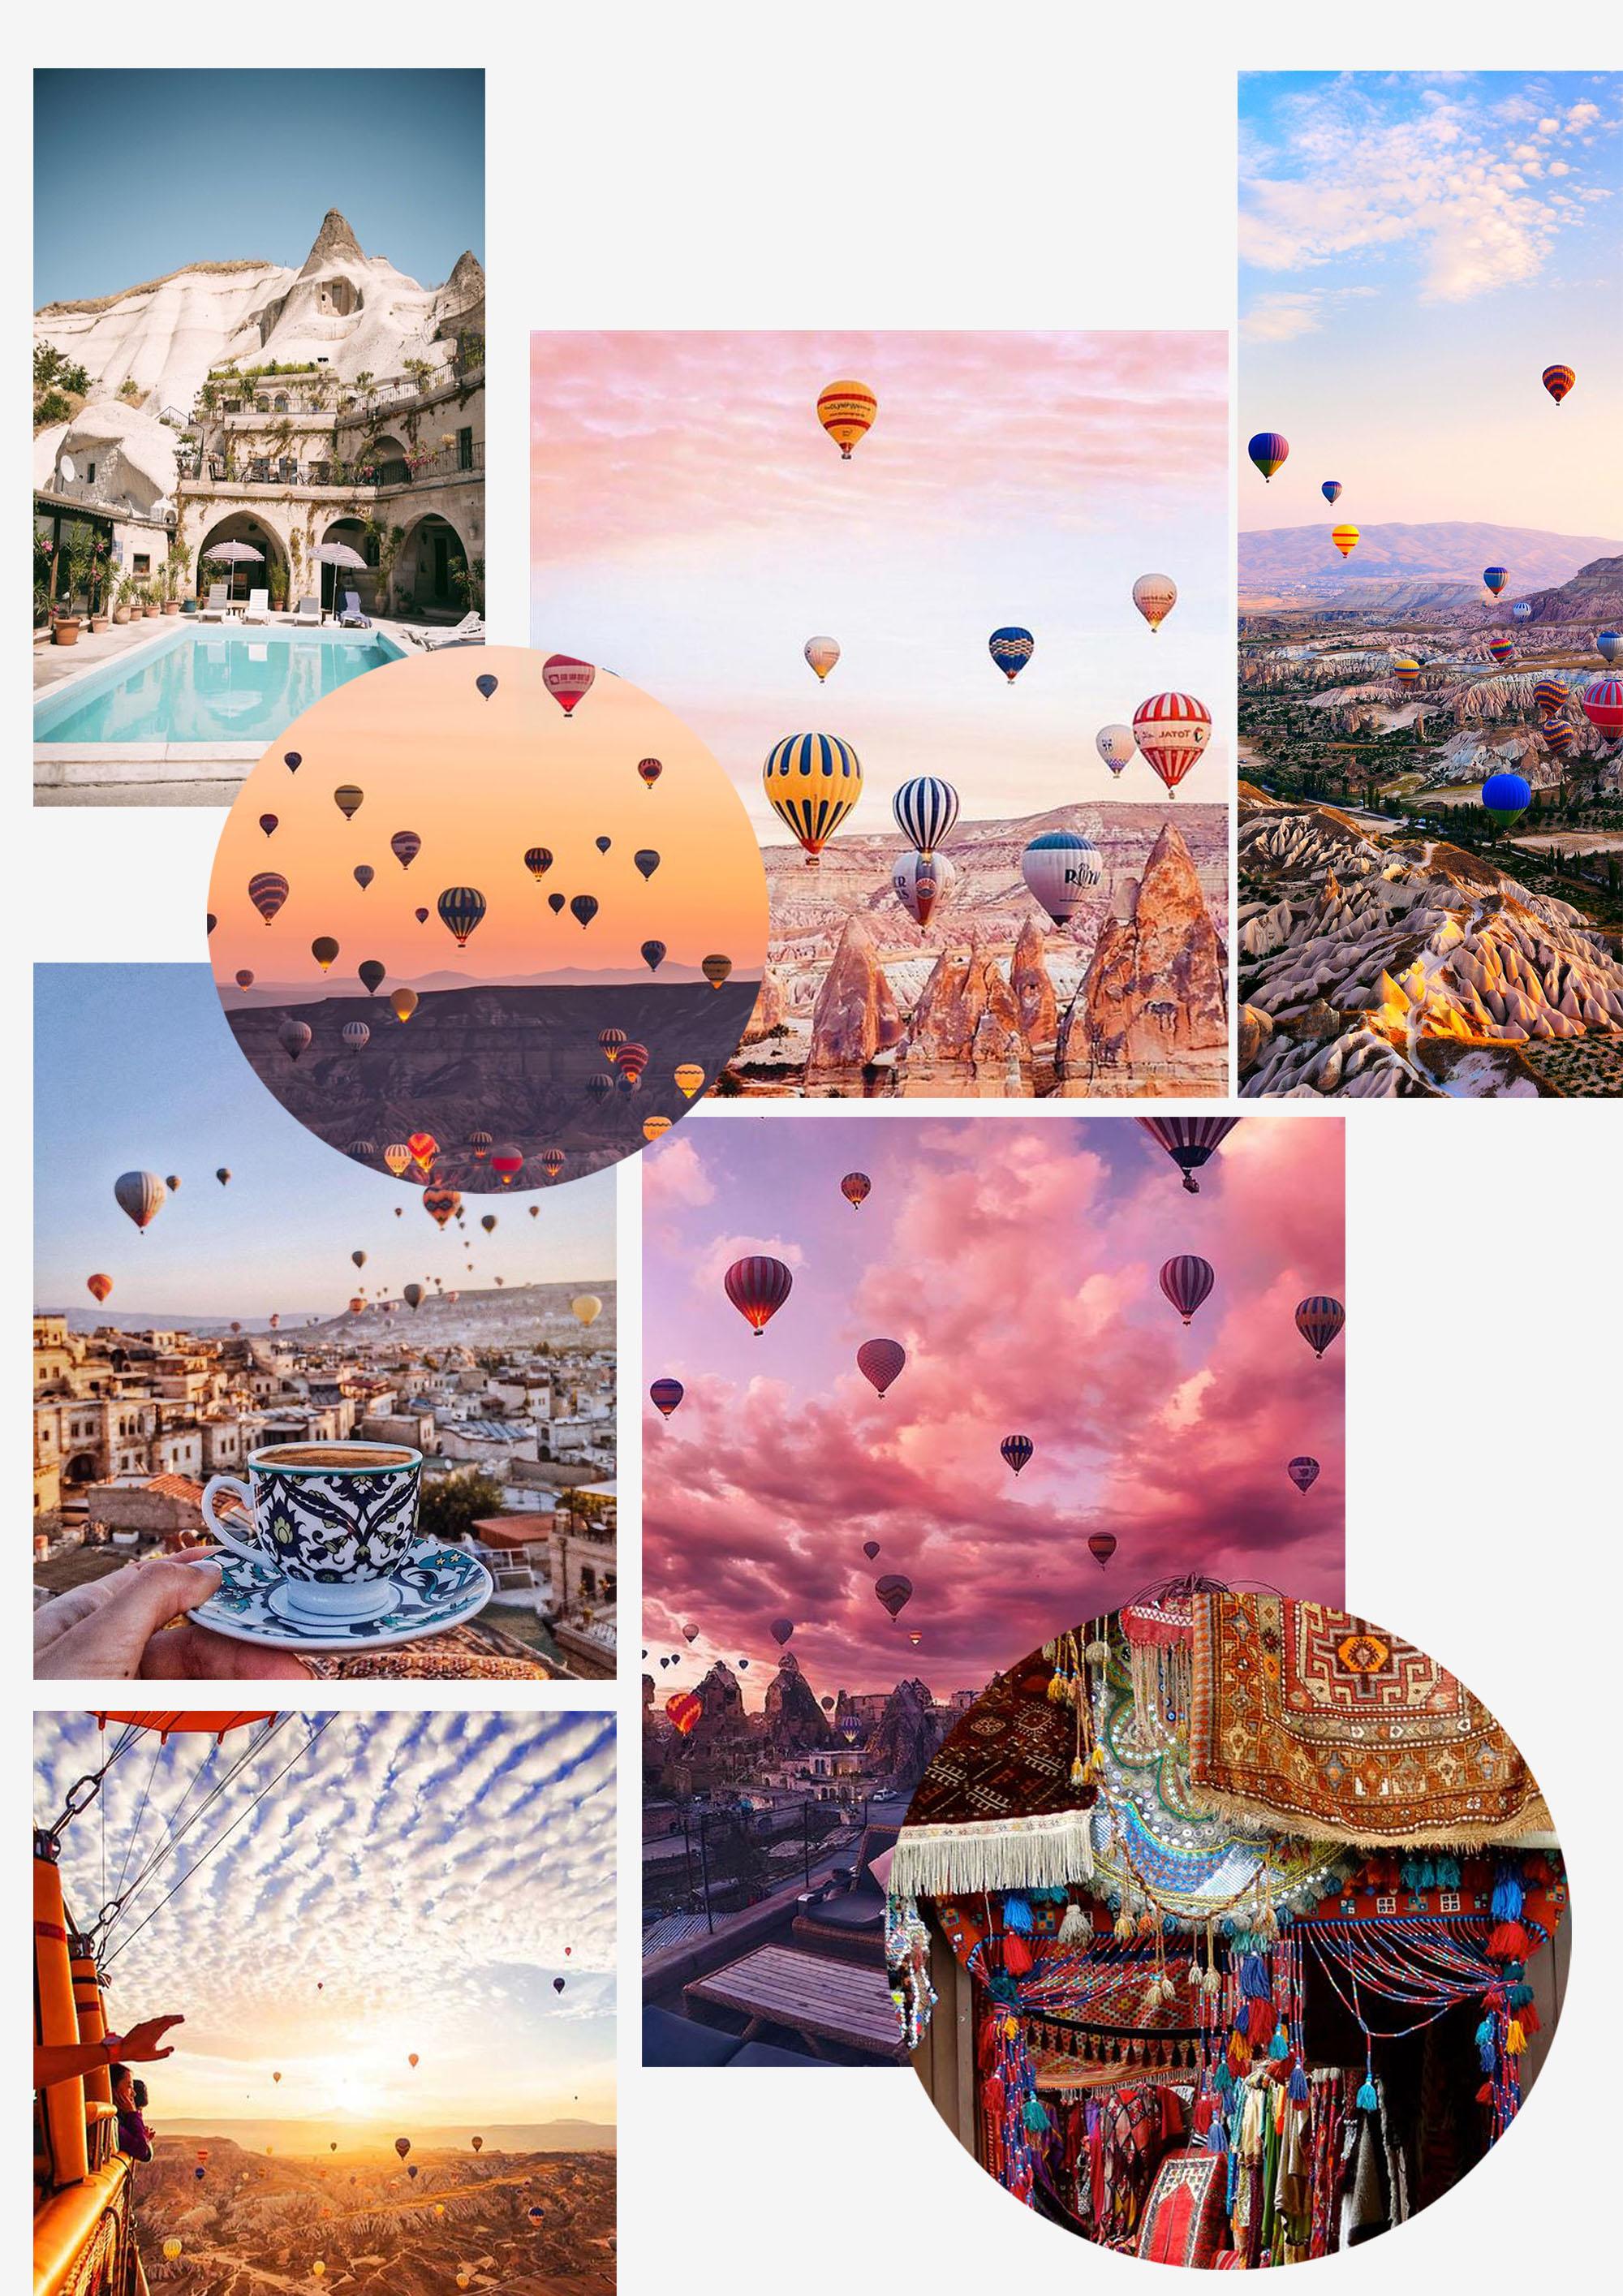 Next Stop: Cappadocia